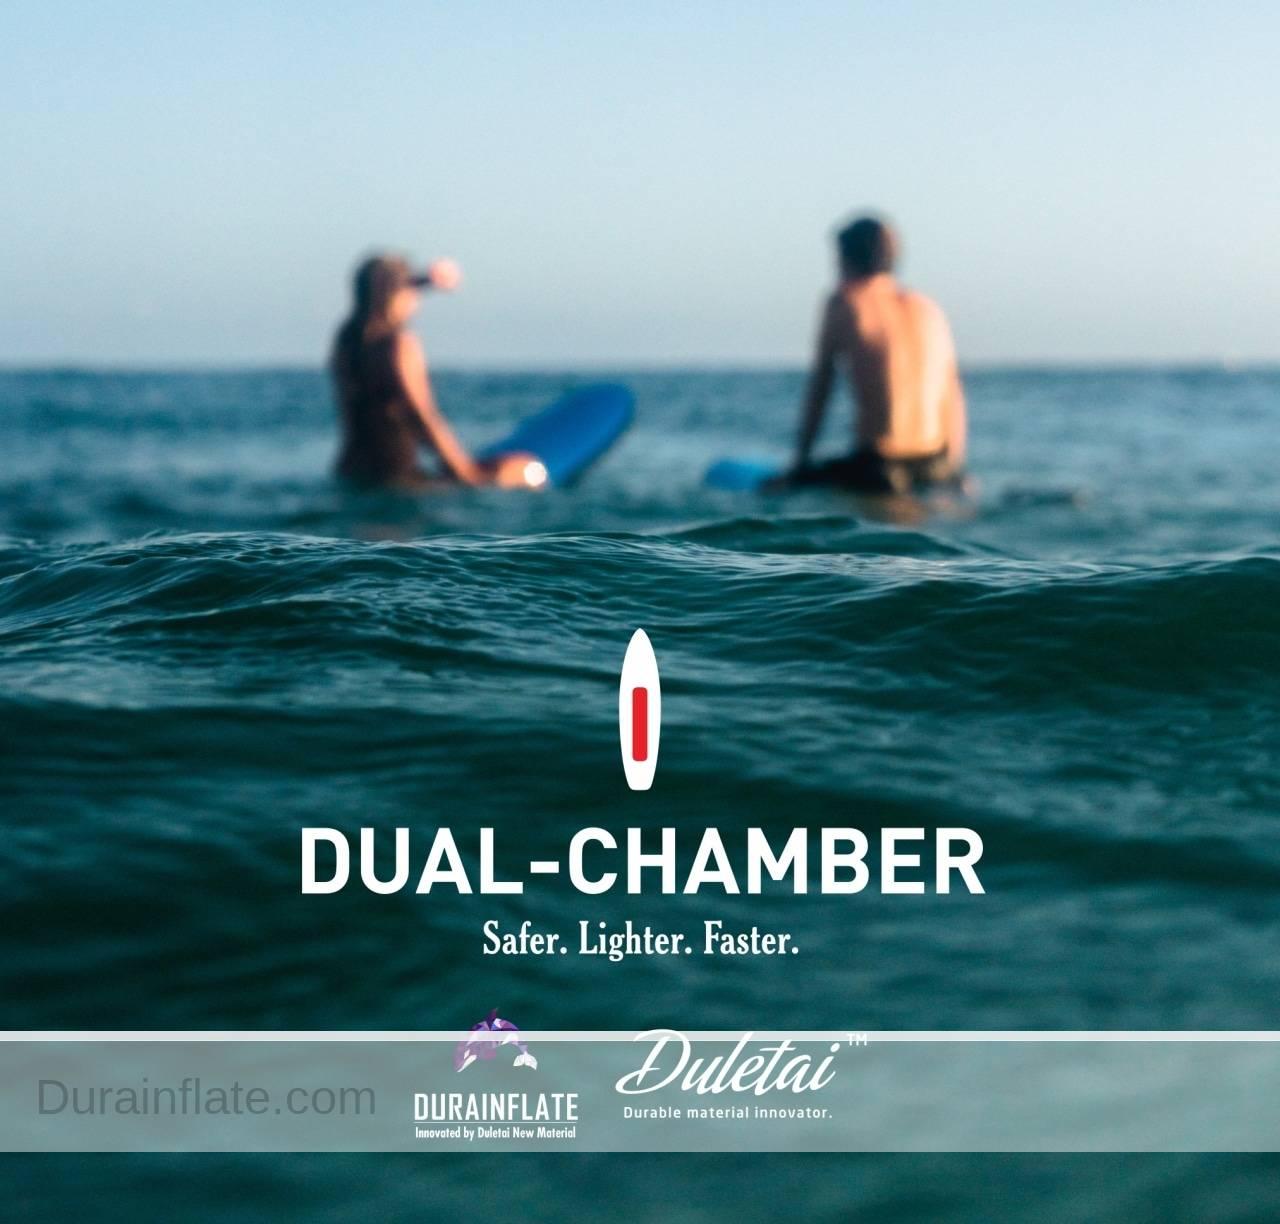 dual chamber SUP